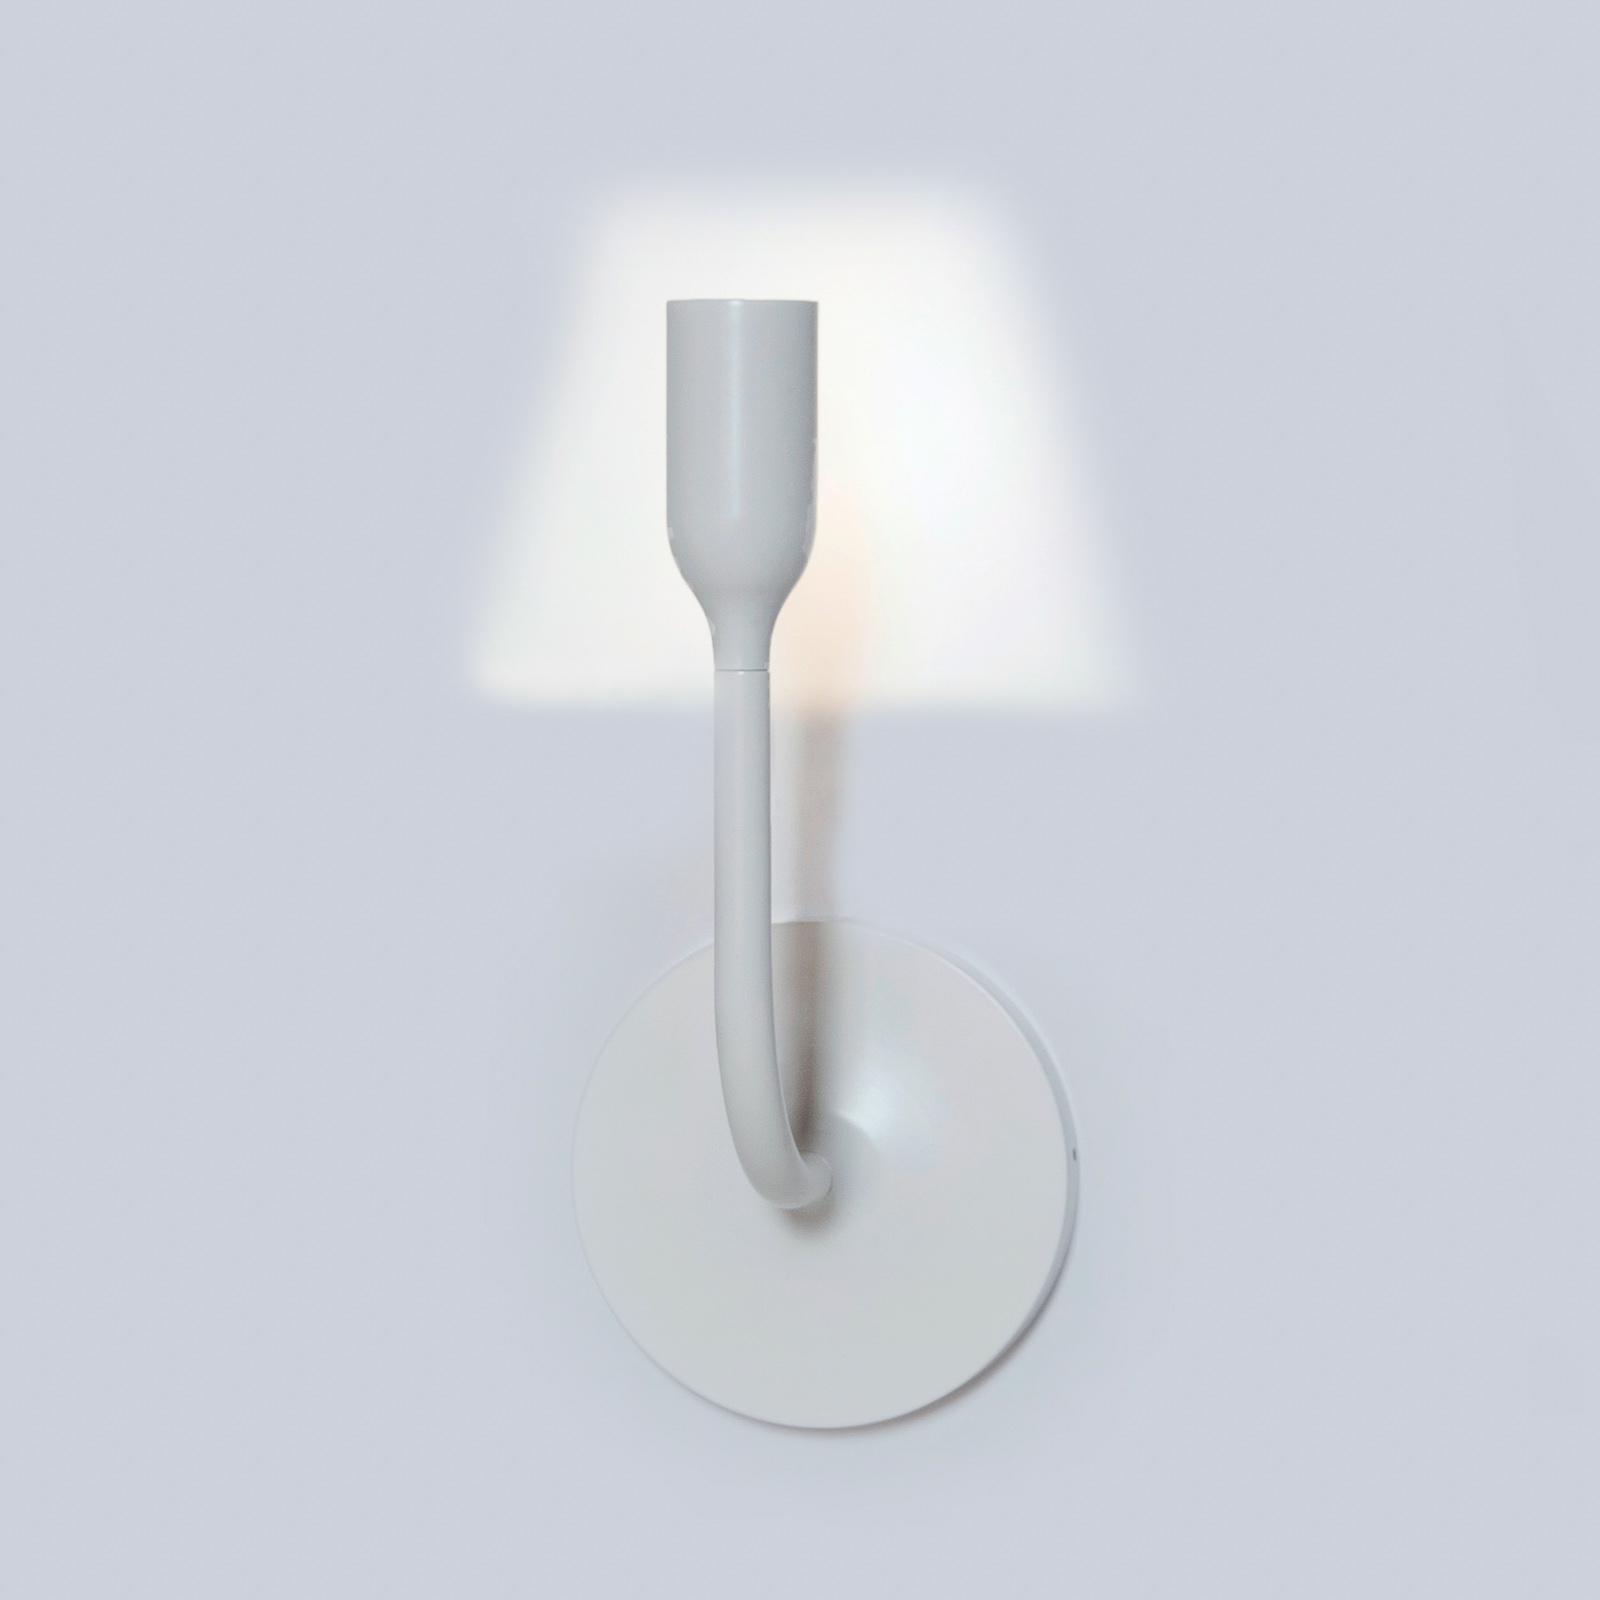 Innermost YOYWall LED-Wandleuchte